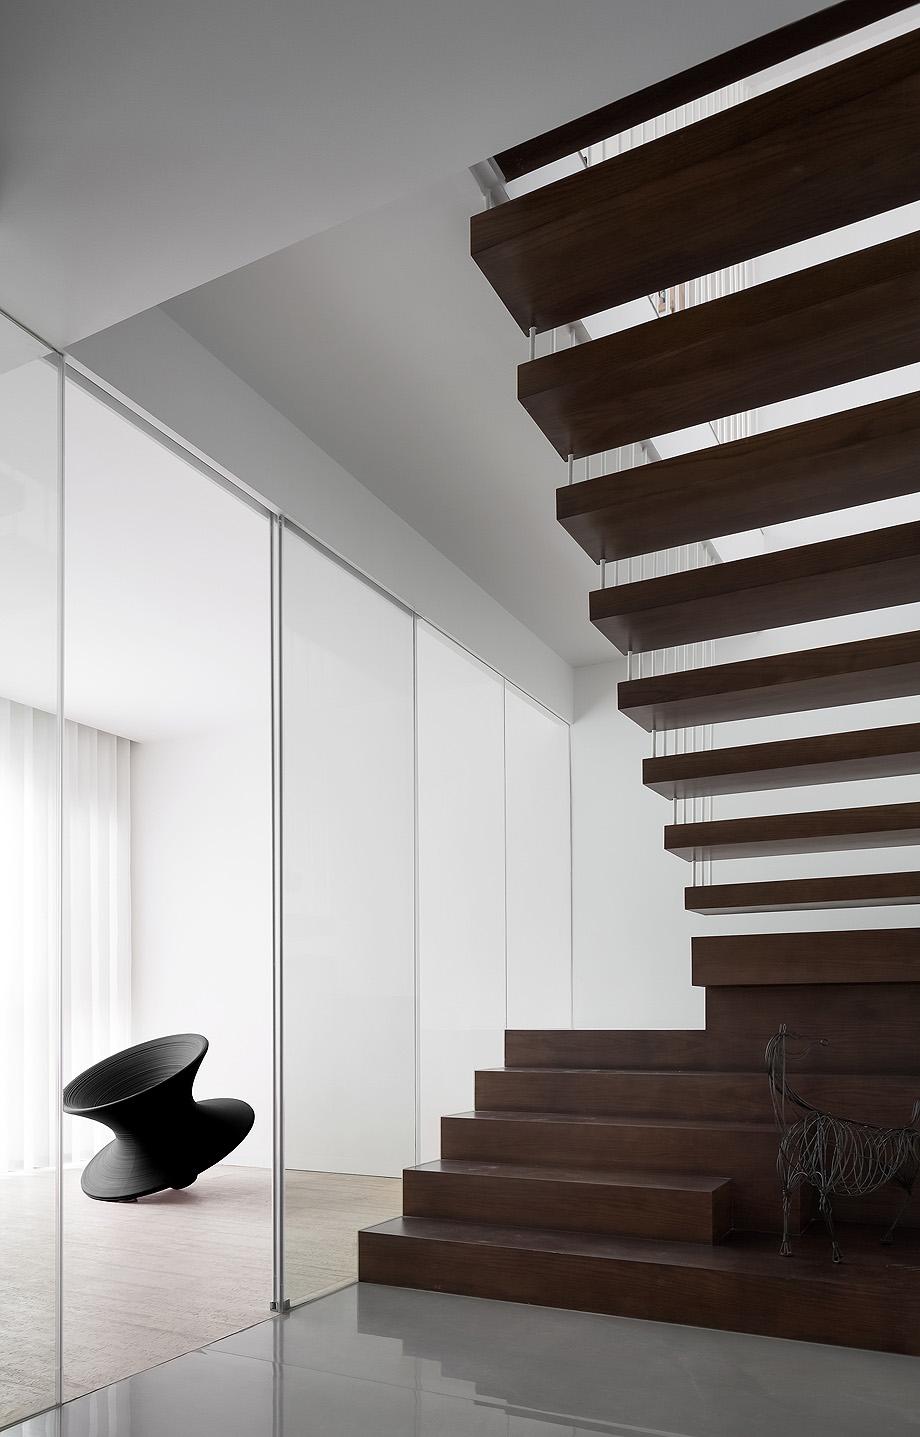 apartamento en shantou de ad architecture - foto ouyang yun (10)